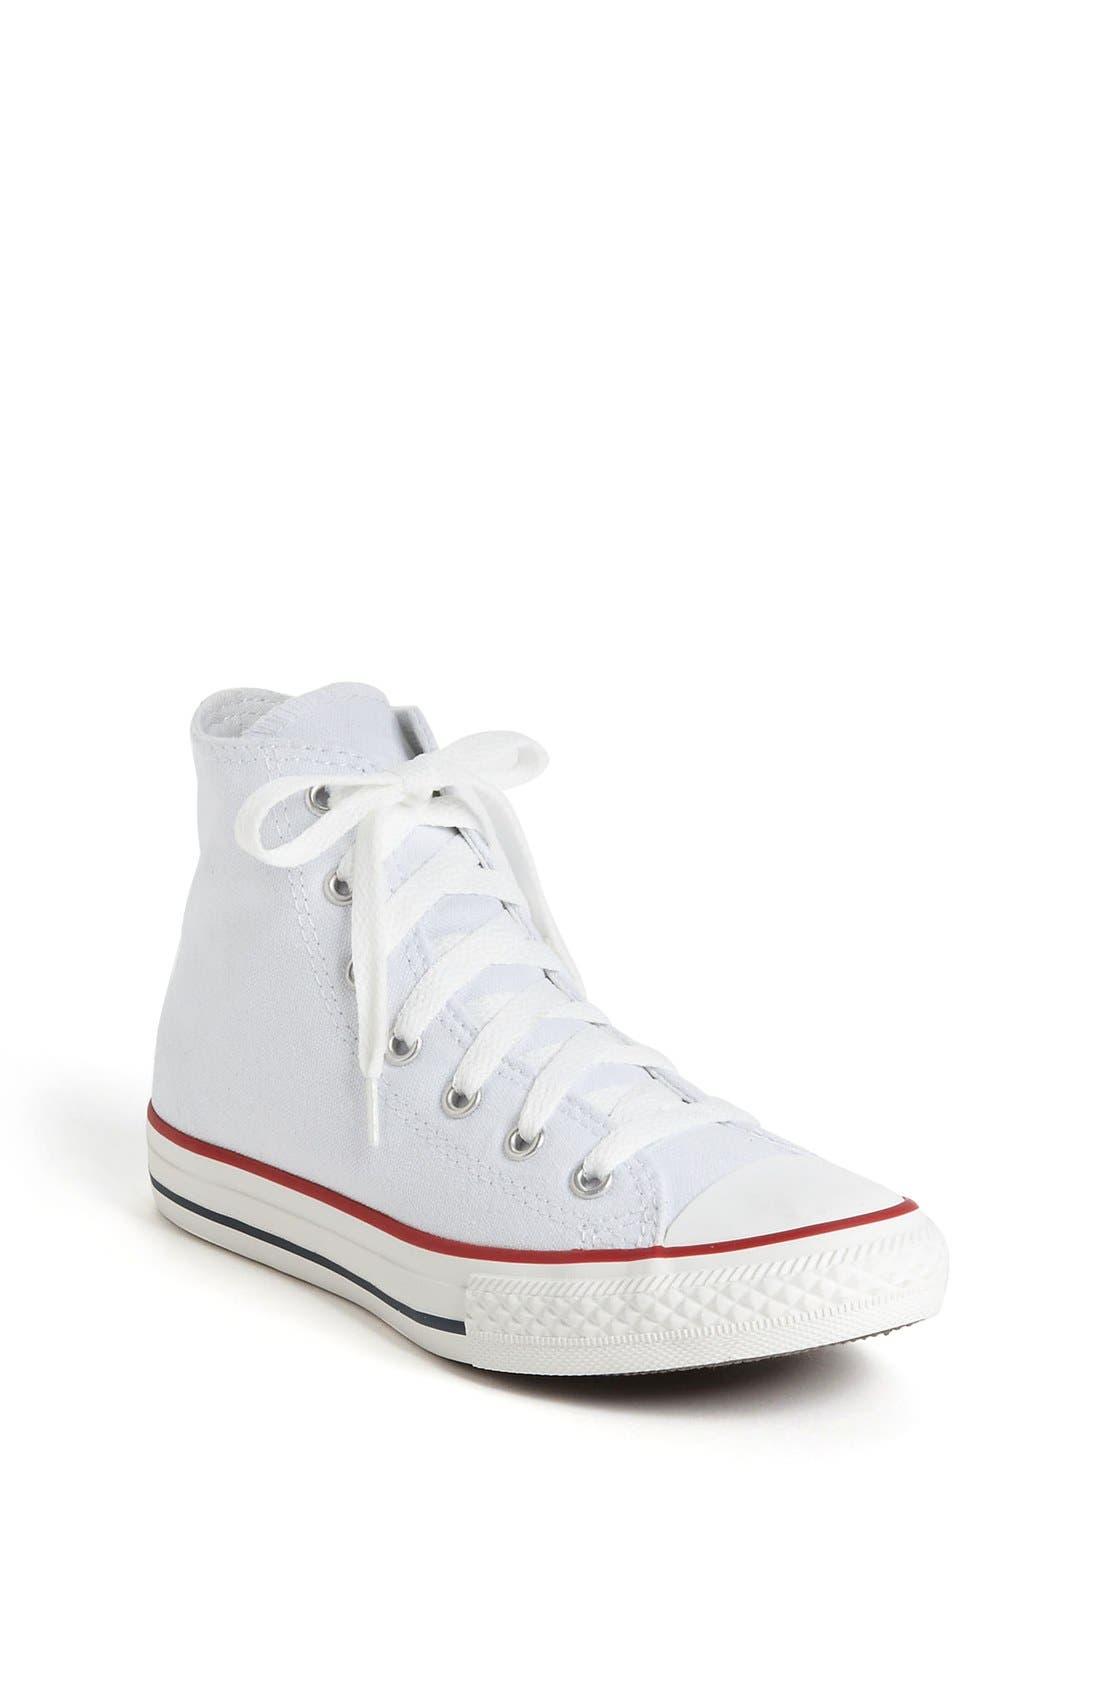 Converse Chuck Taylor® All Star® High